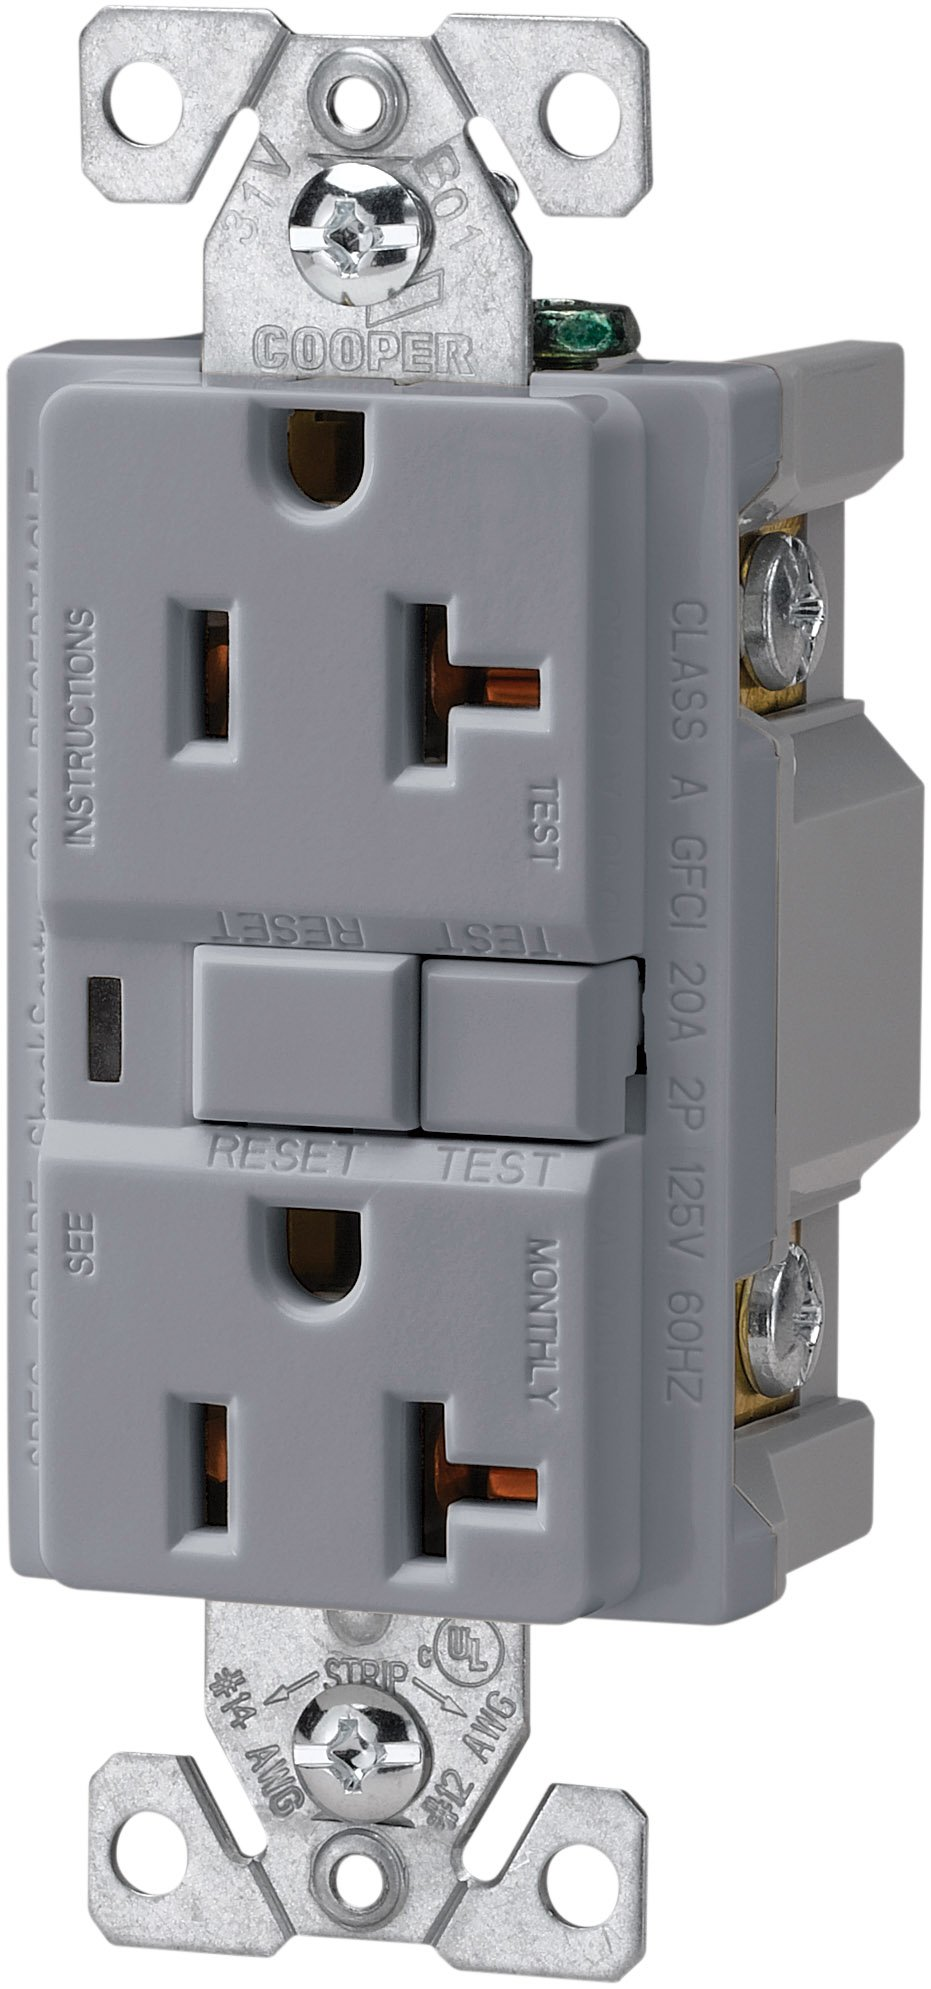 The Eaton VGF20GY 20-Amp 2-Pole 3-Wire 125-Volt Duplex Ground Fault Circuit Interrupter, Gray